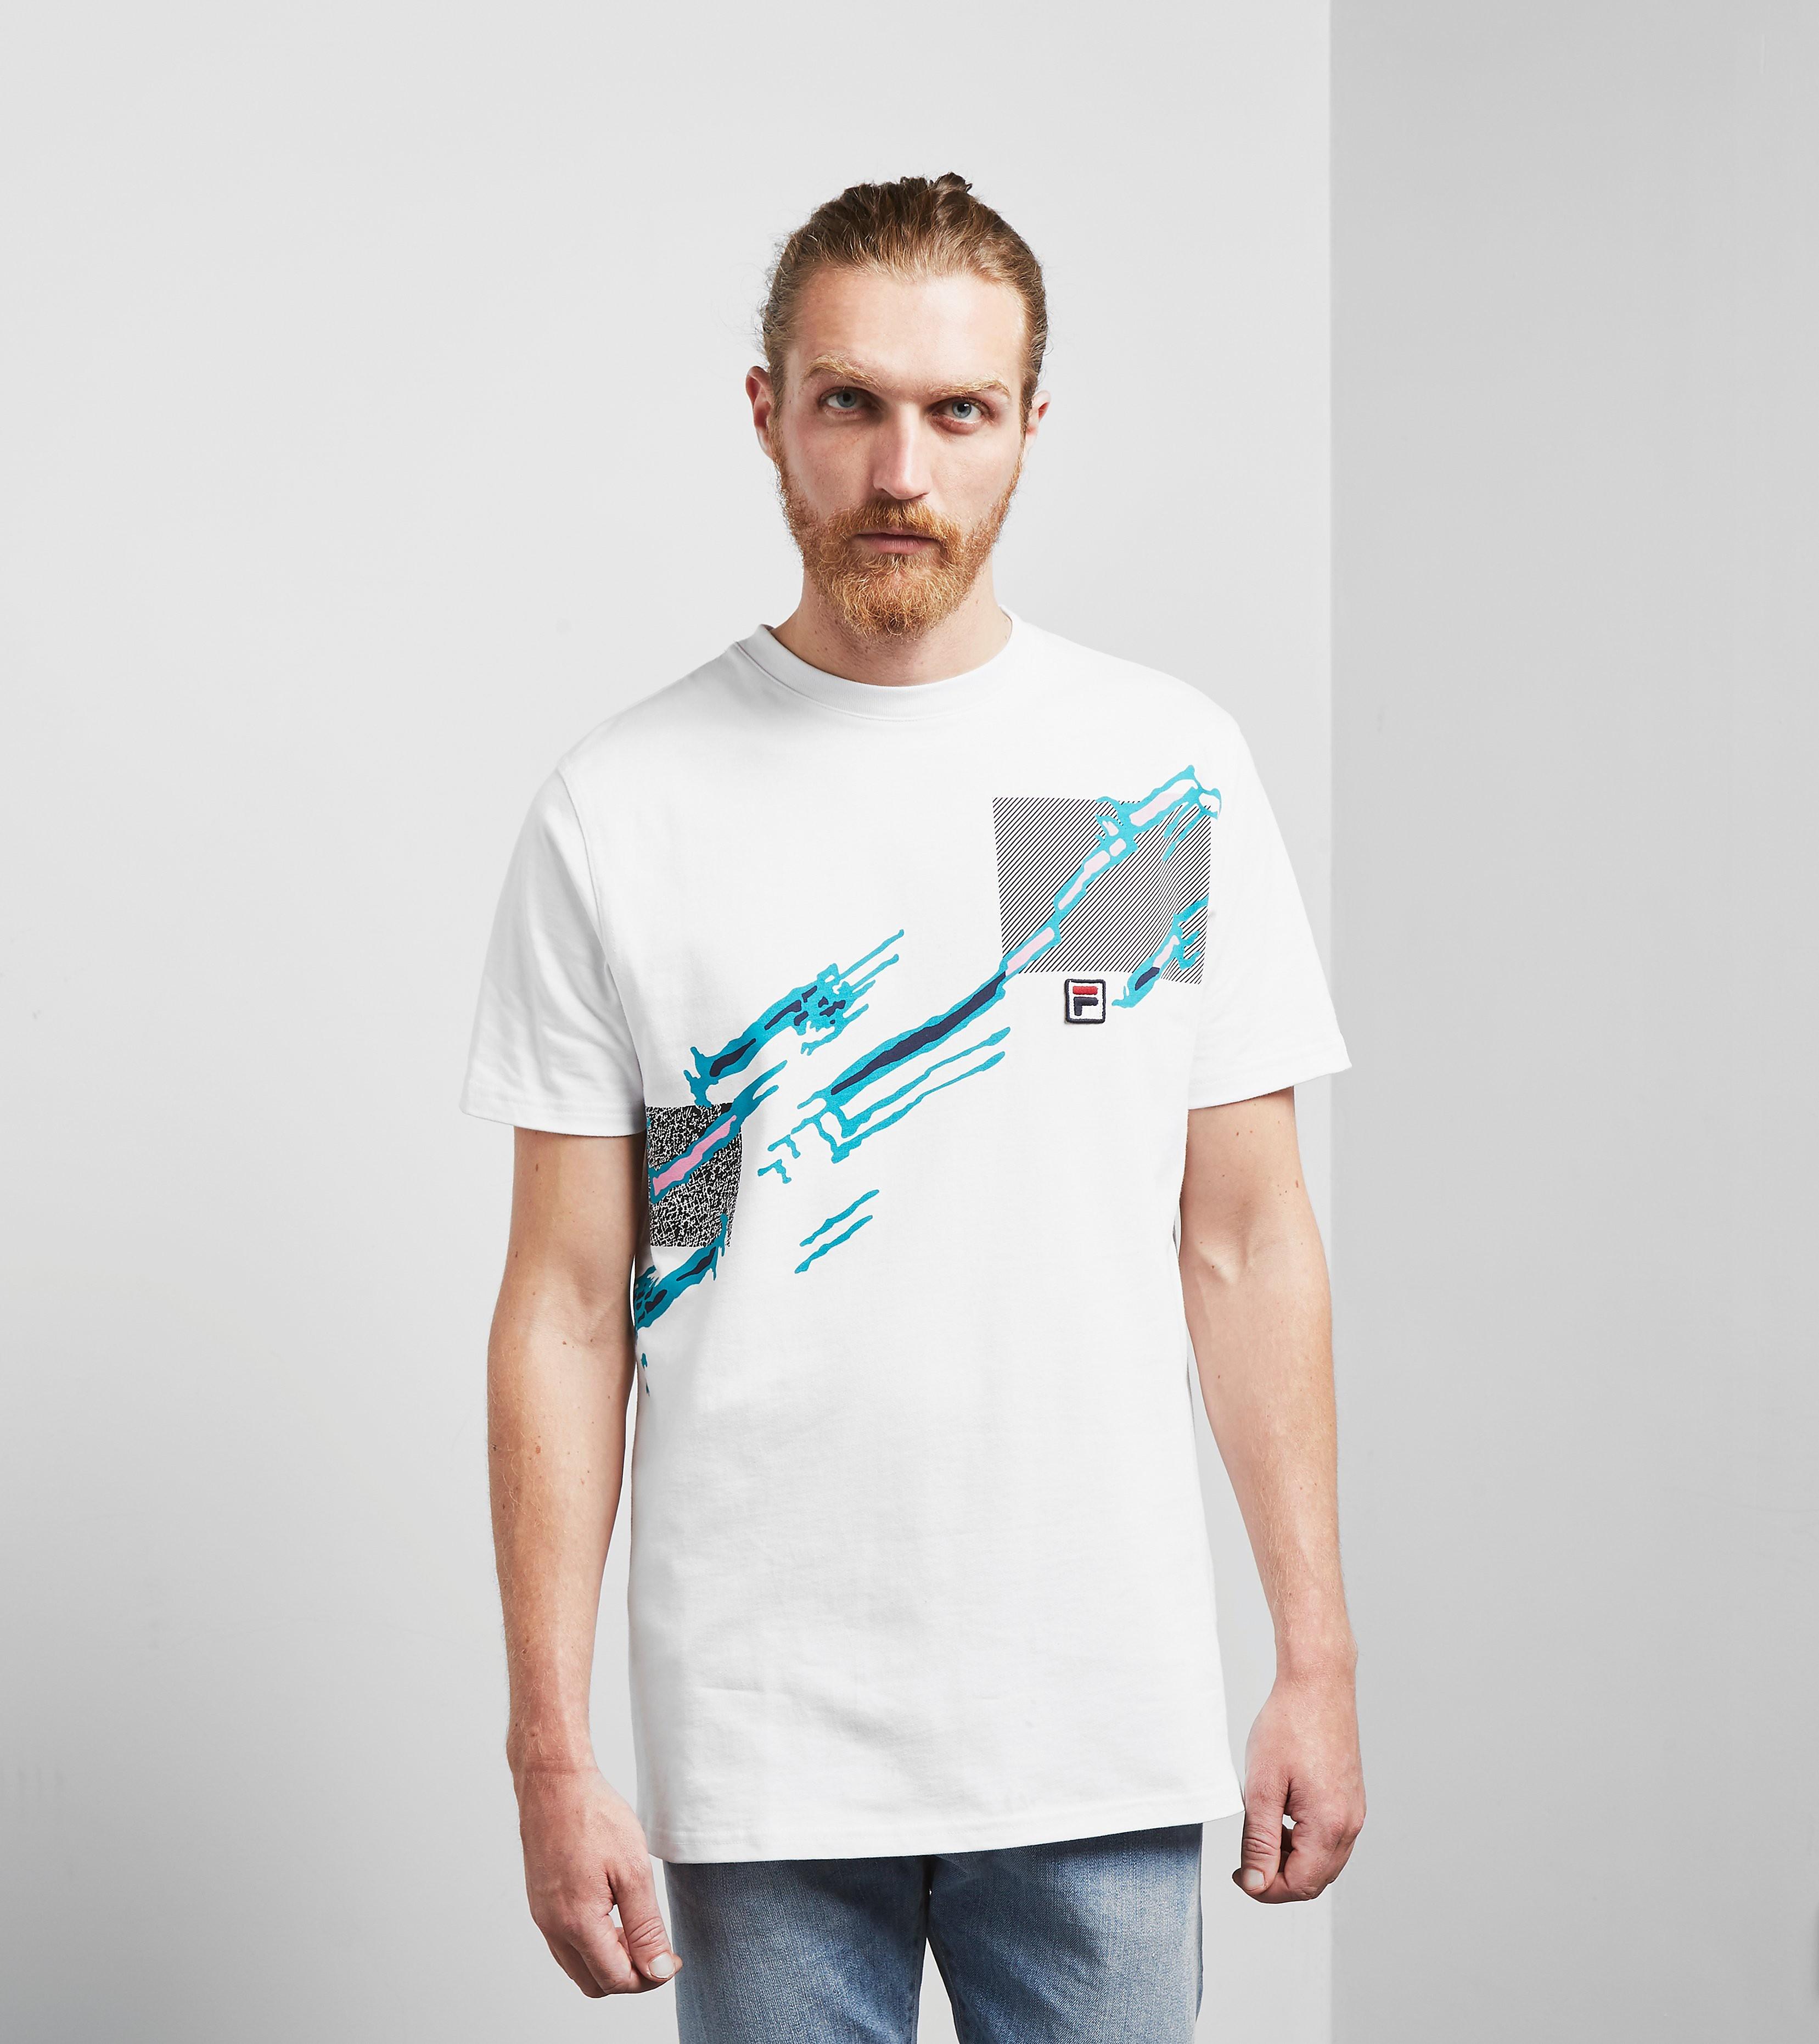 Fila Bridgehampton T-Shirt - size? Exclusive